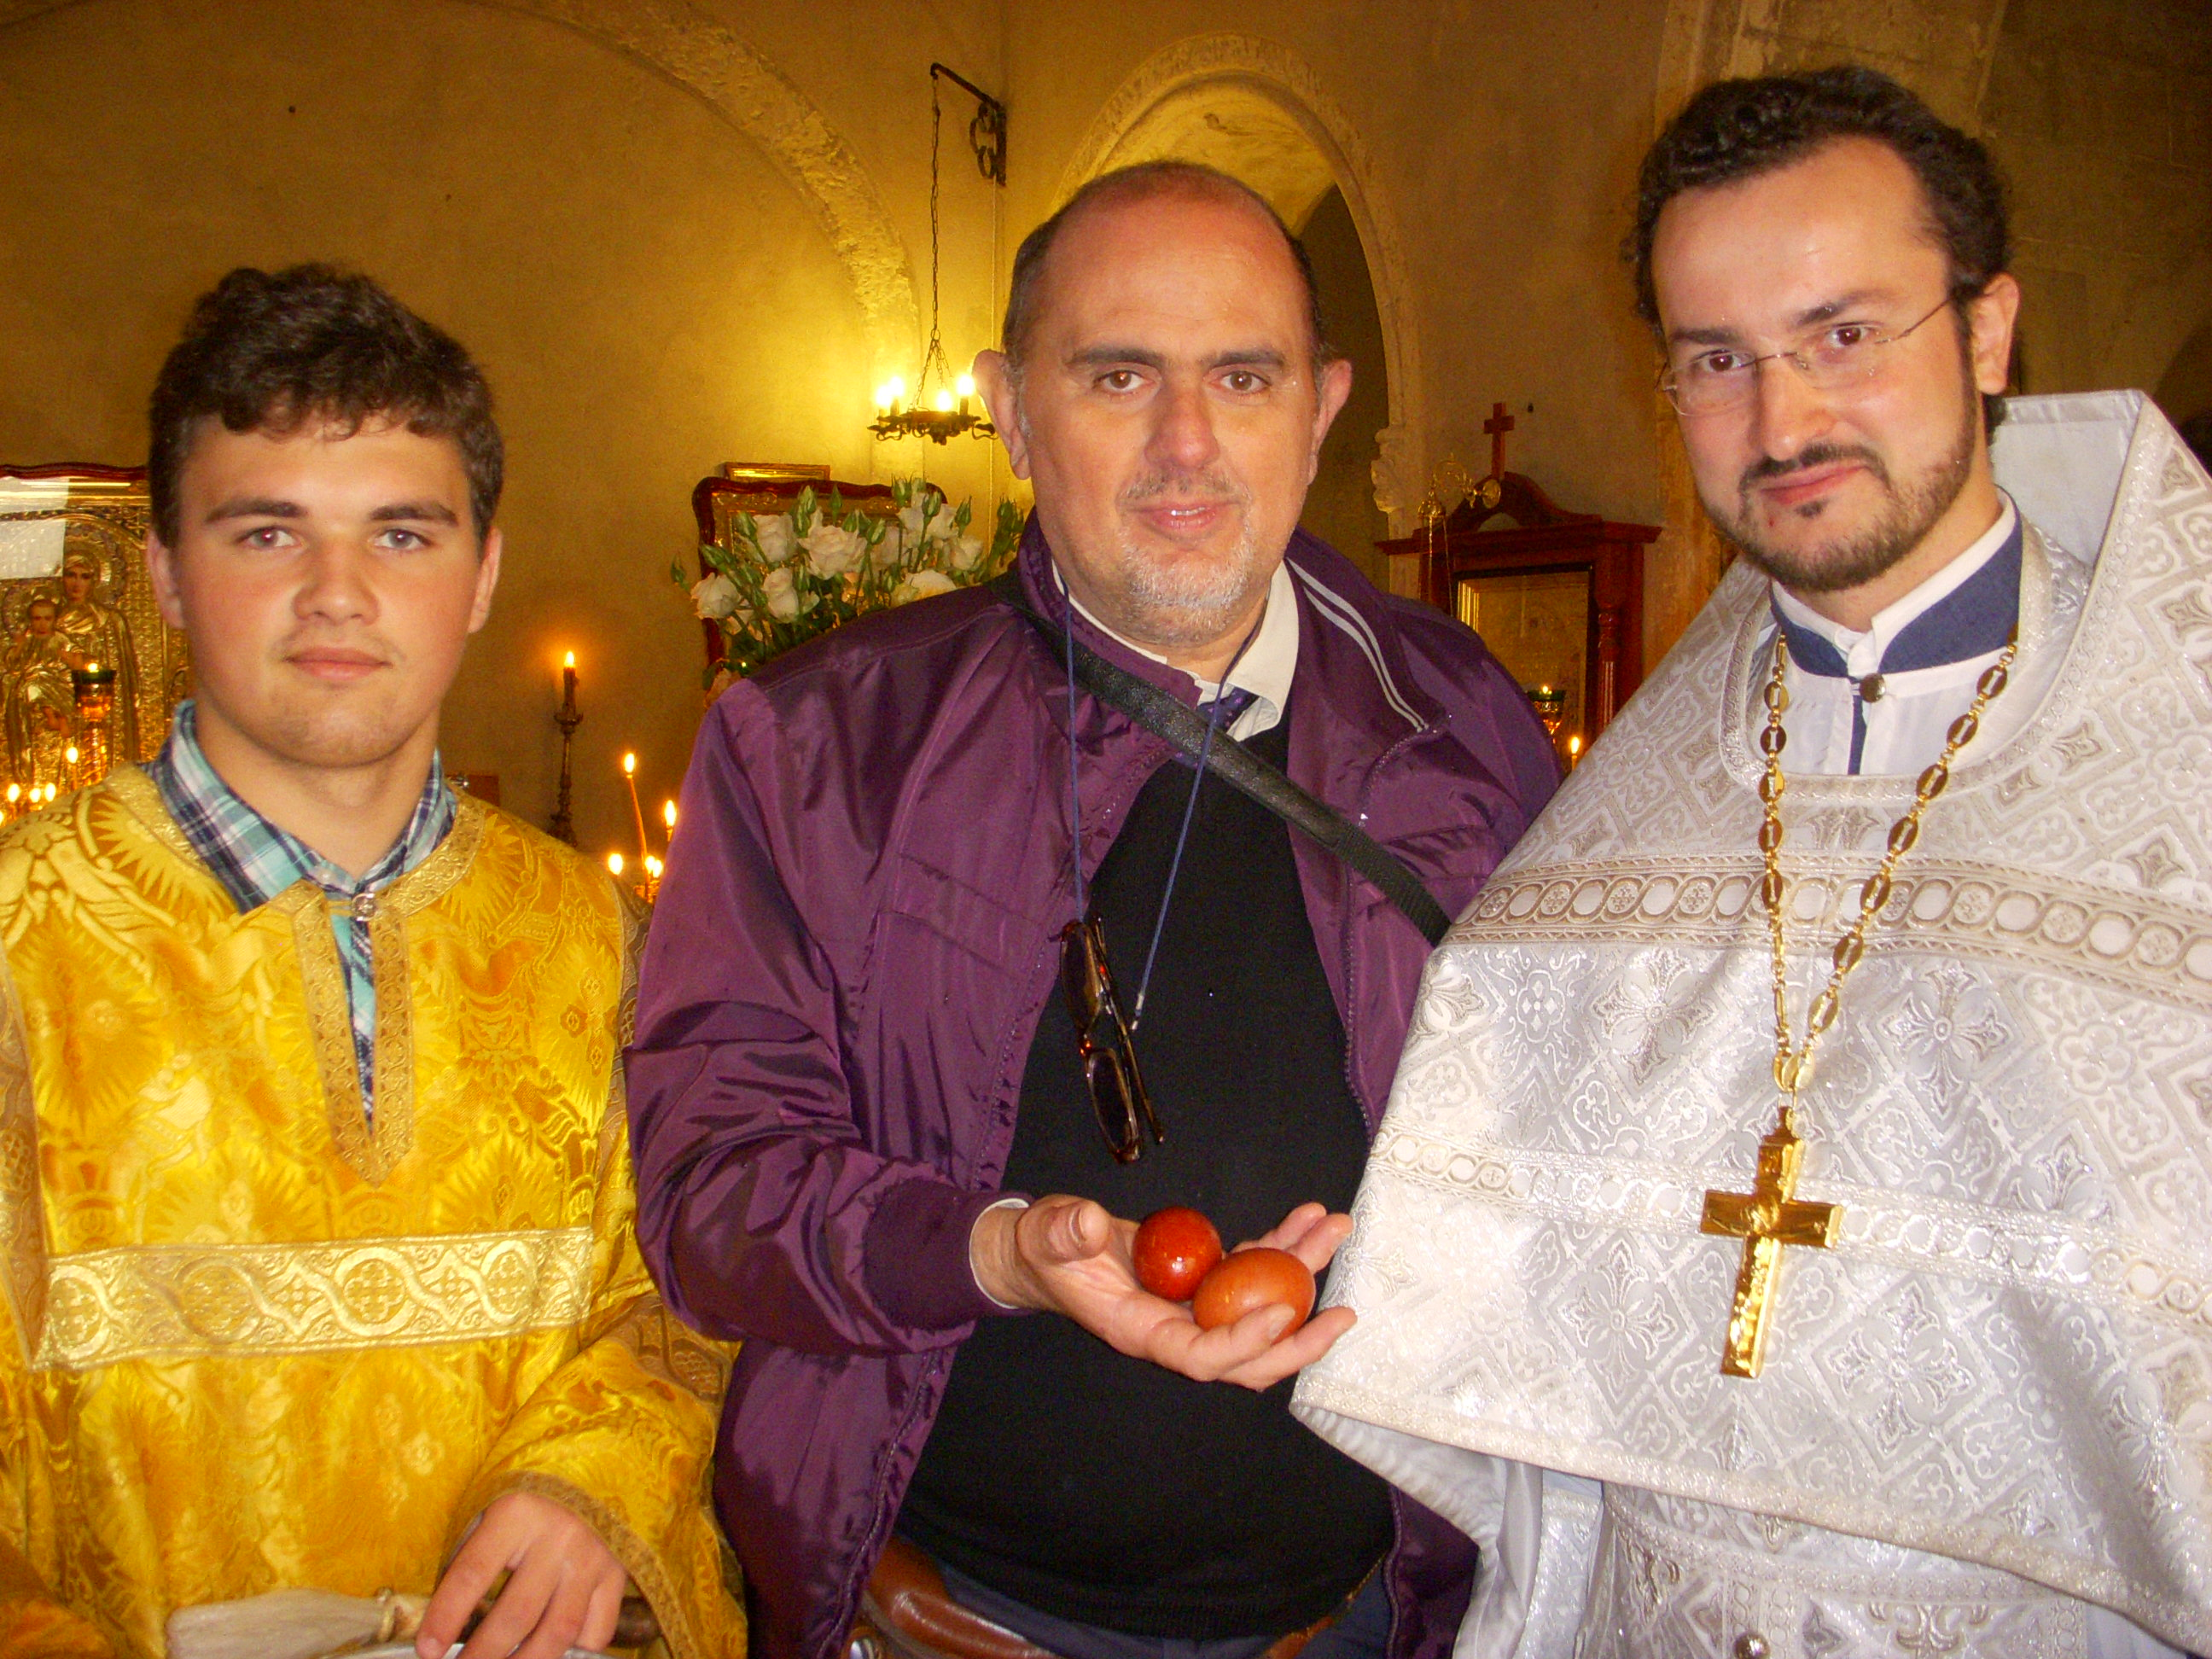 maggio-2013_pasqua-ortodossa-139.JPG